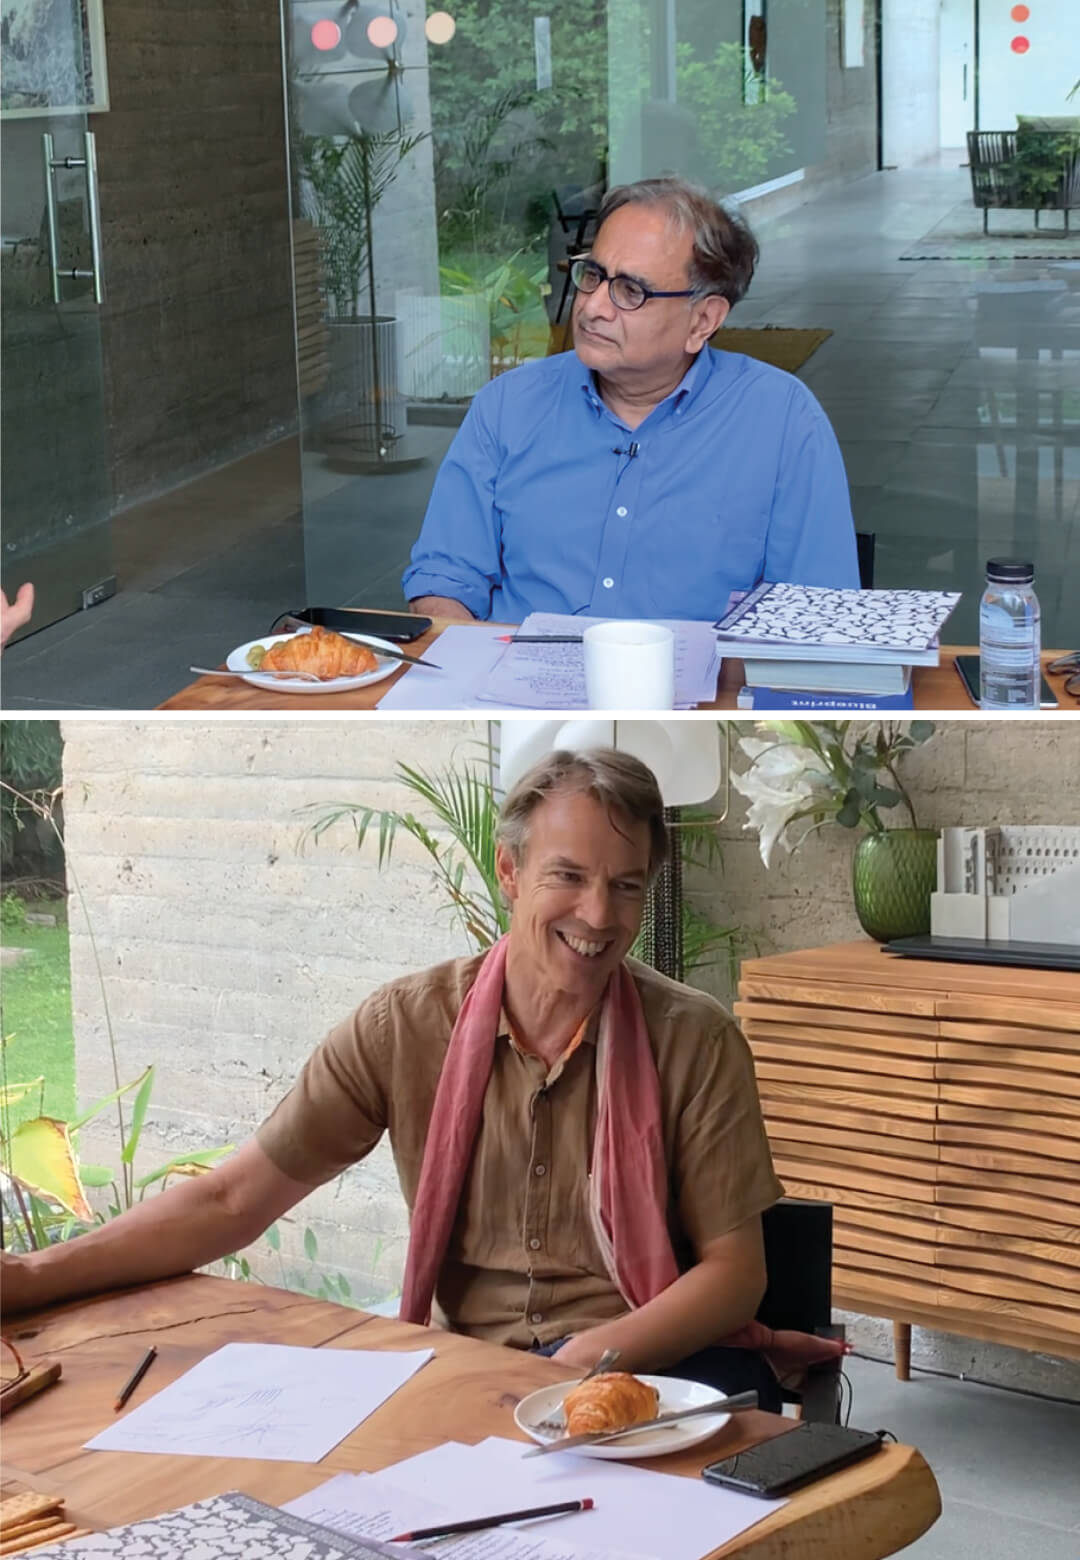 Prof. Anne Feenstra X Gautam Bhatia: Fable, truth and Rendition | Anne Feenstra | Gautam Bhatia | STIRworld